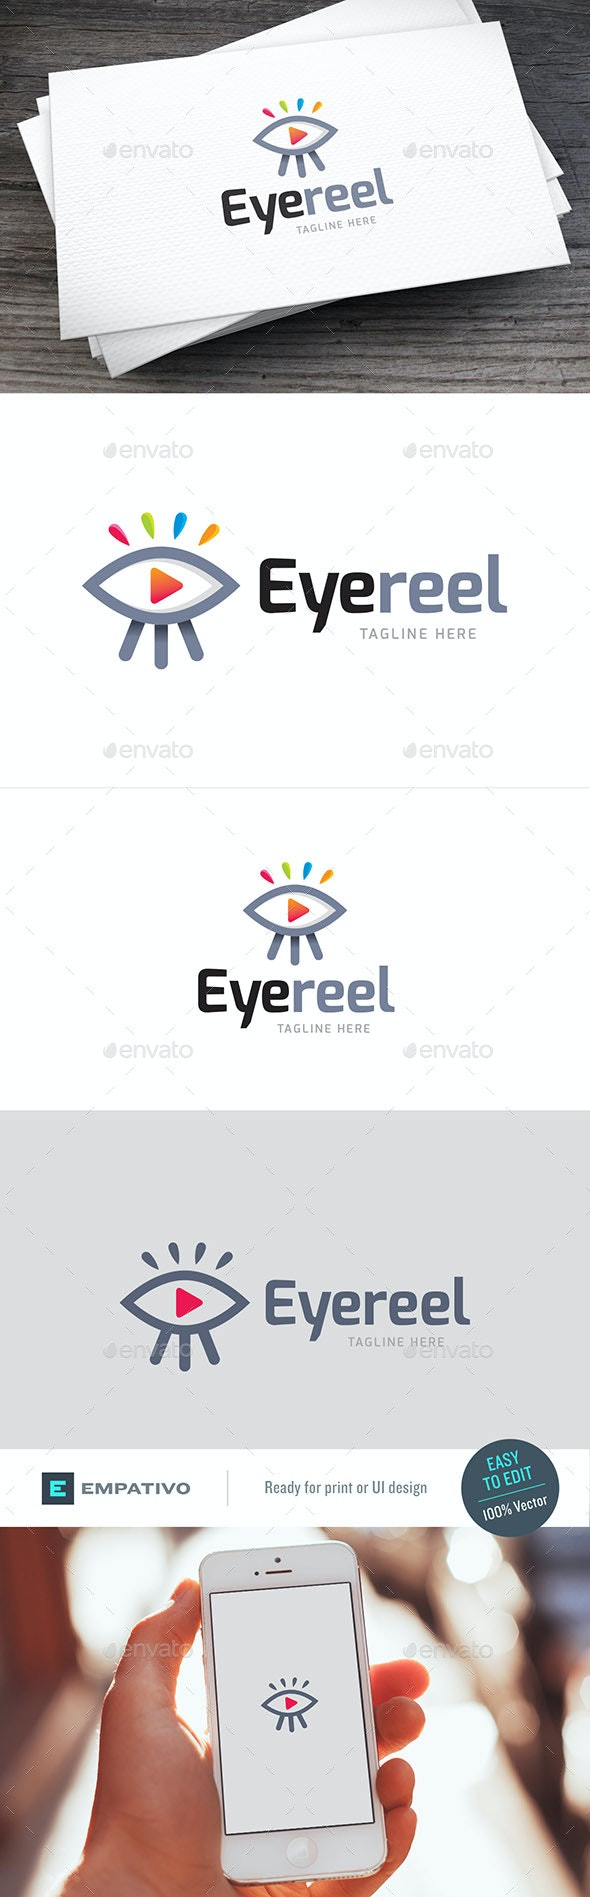 Eyefilms Logo Template - Objects Logo Templates